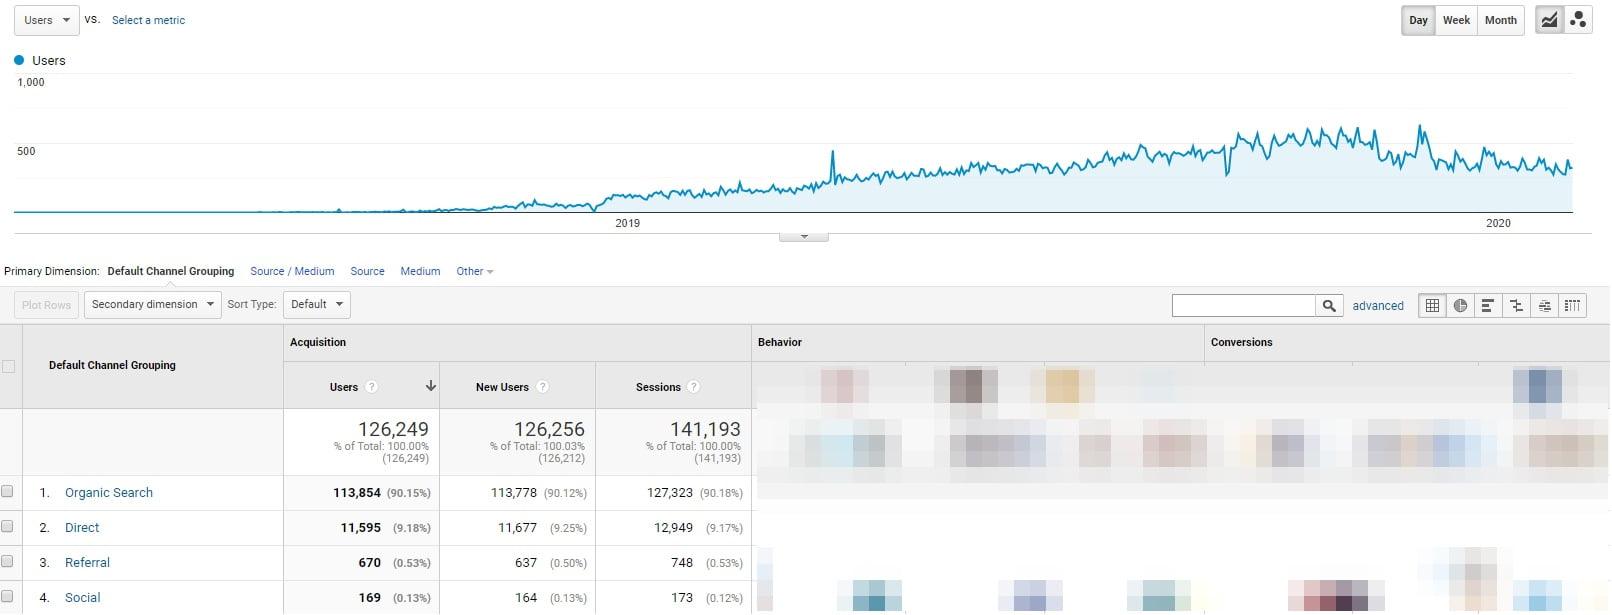 Startup traffic